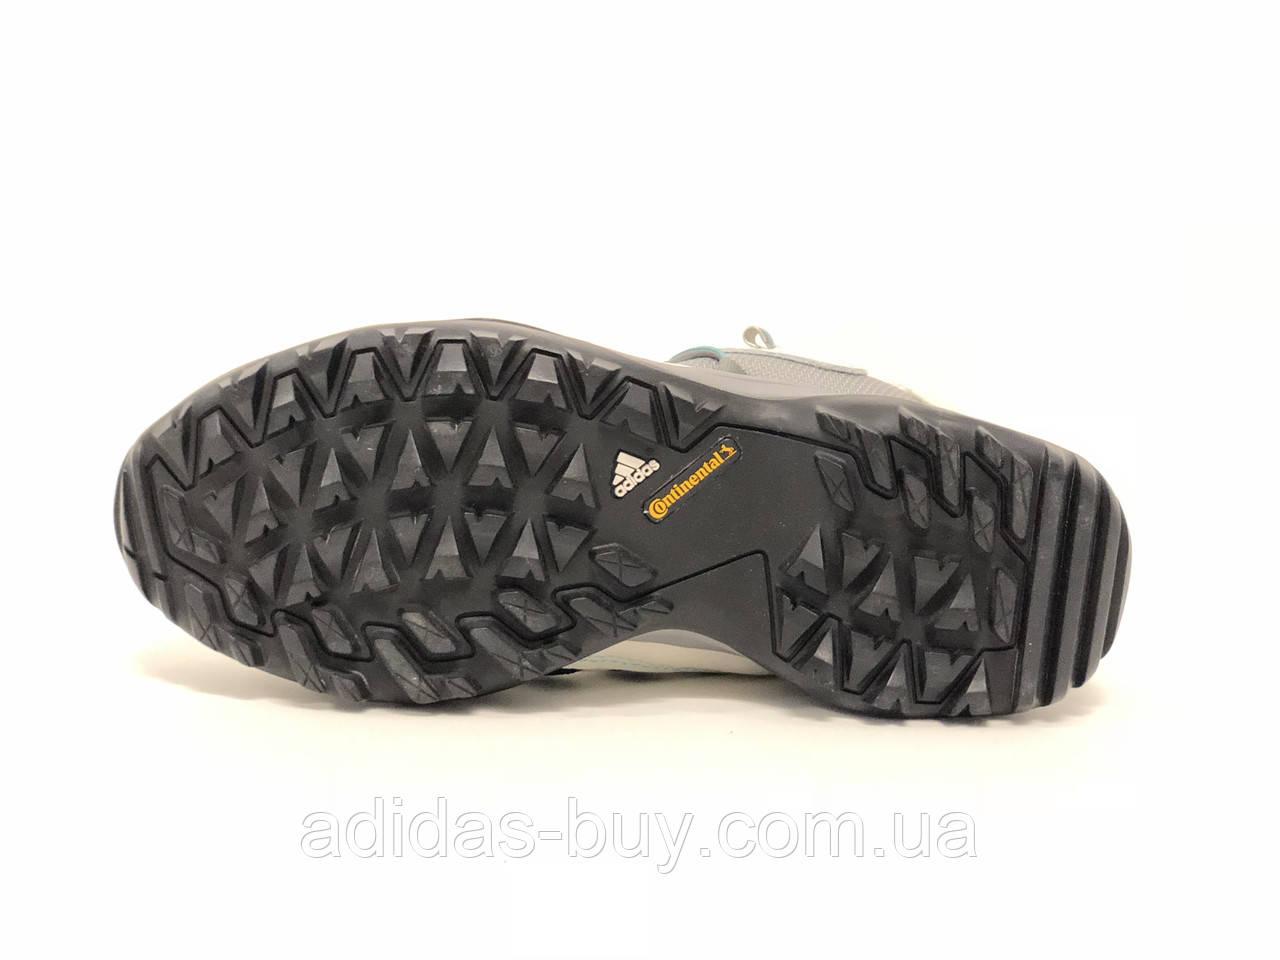 b0fc14c8 ... Ботинки женские adidas CLIMAHEAT WINTER HIKER II M17332 цвет: белый 5  ...